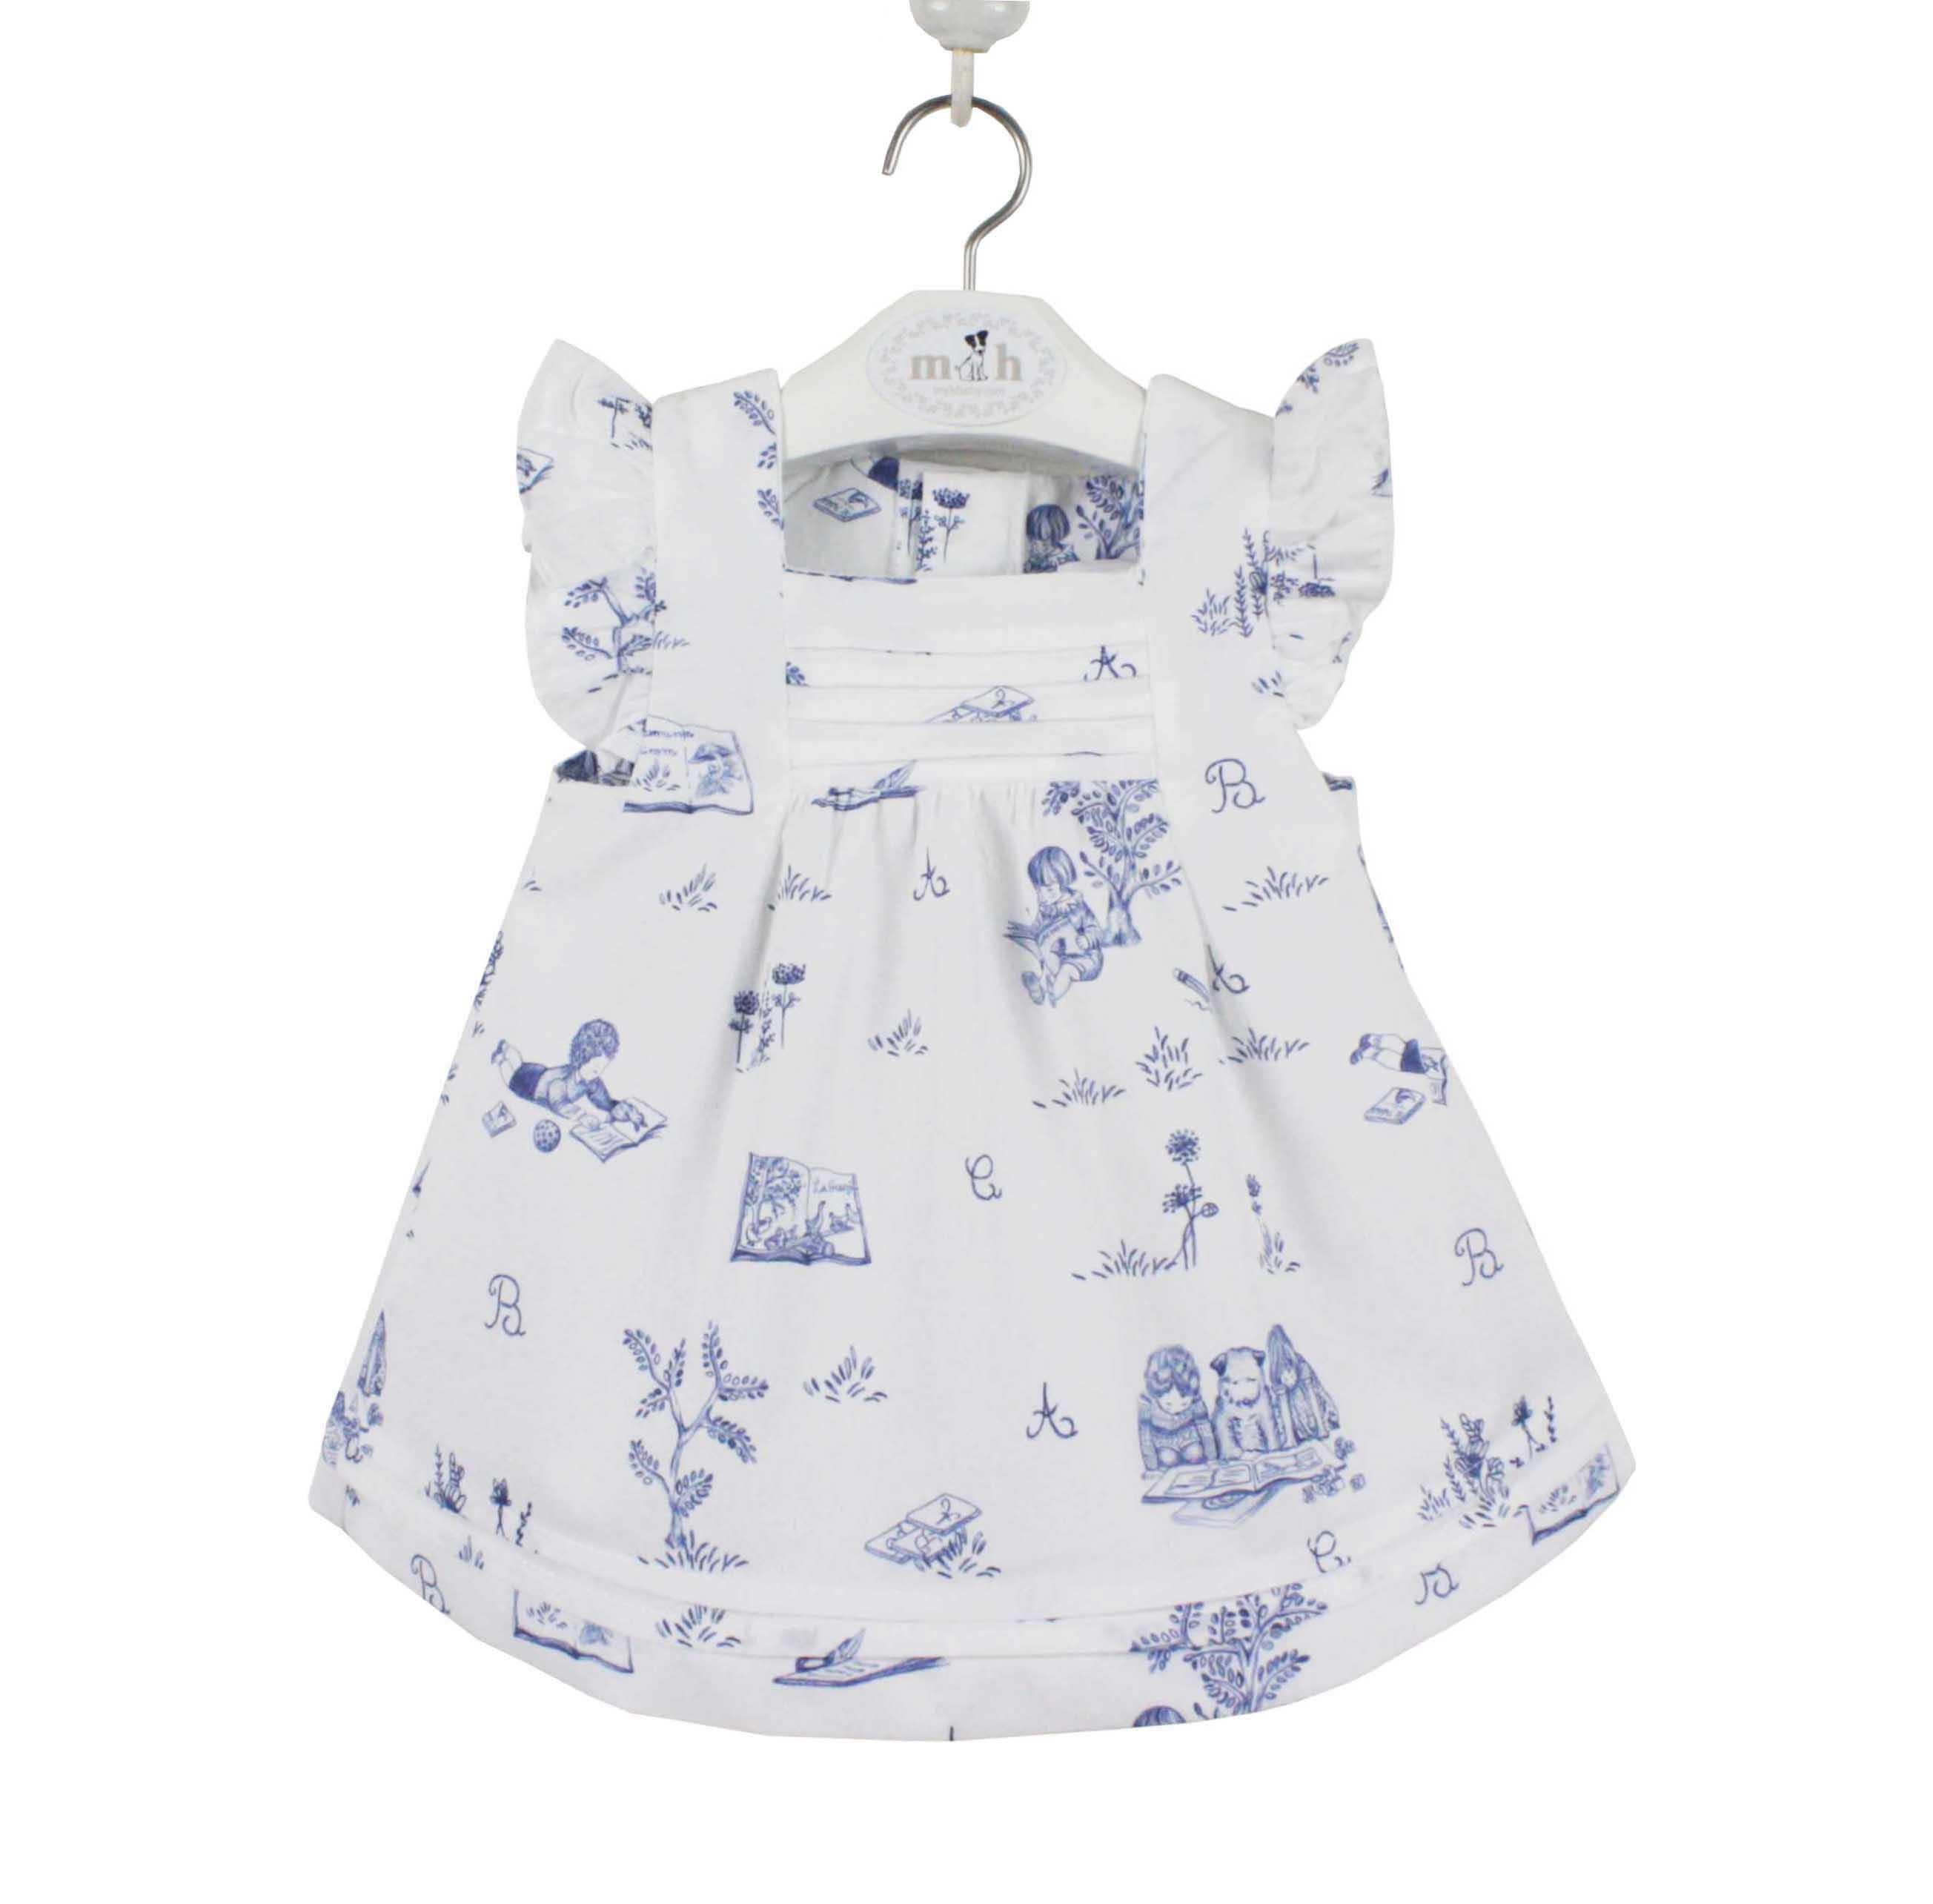 460619e1a427 Blue Toile short dress. Mafalda Model